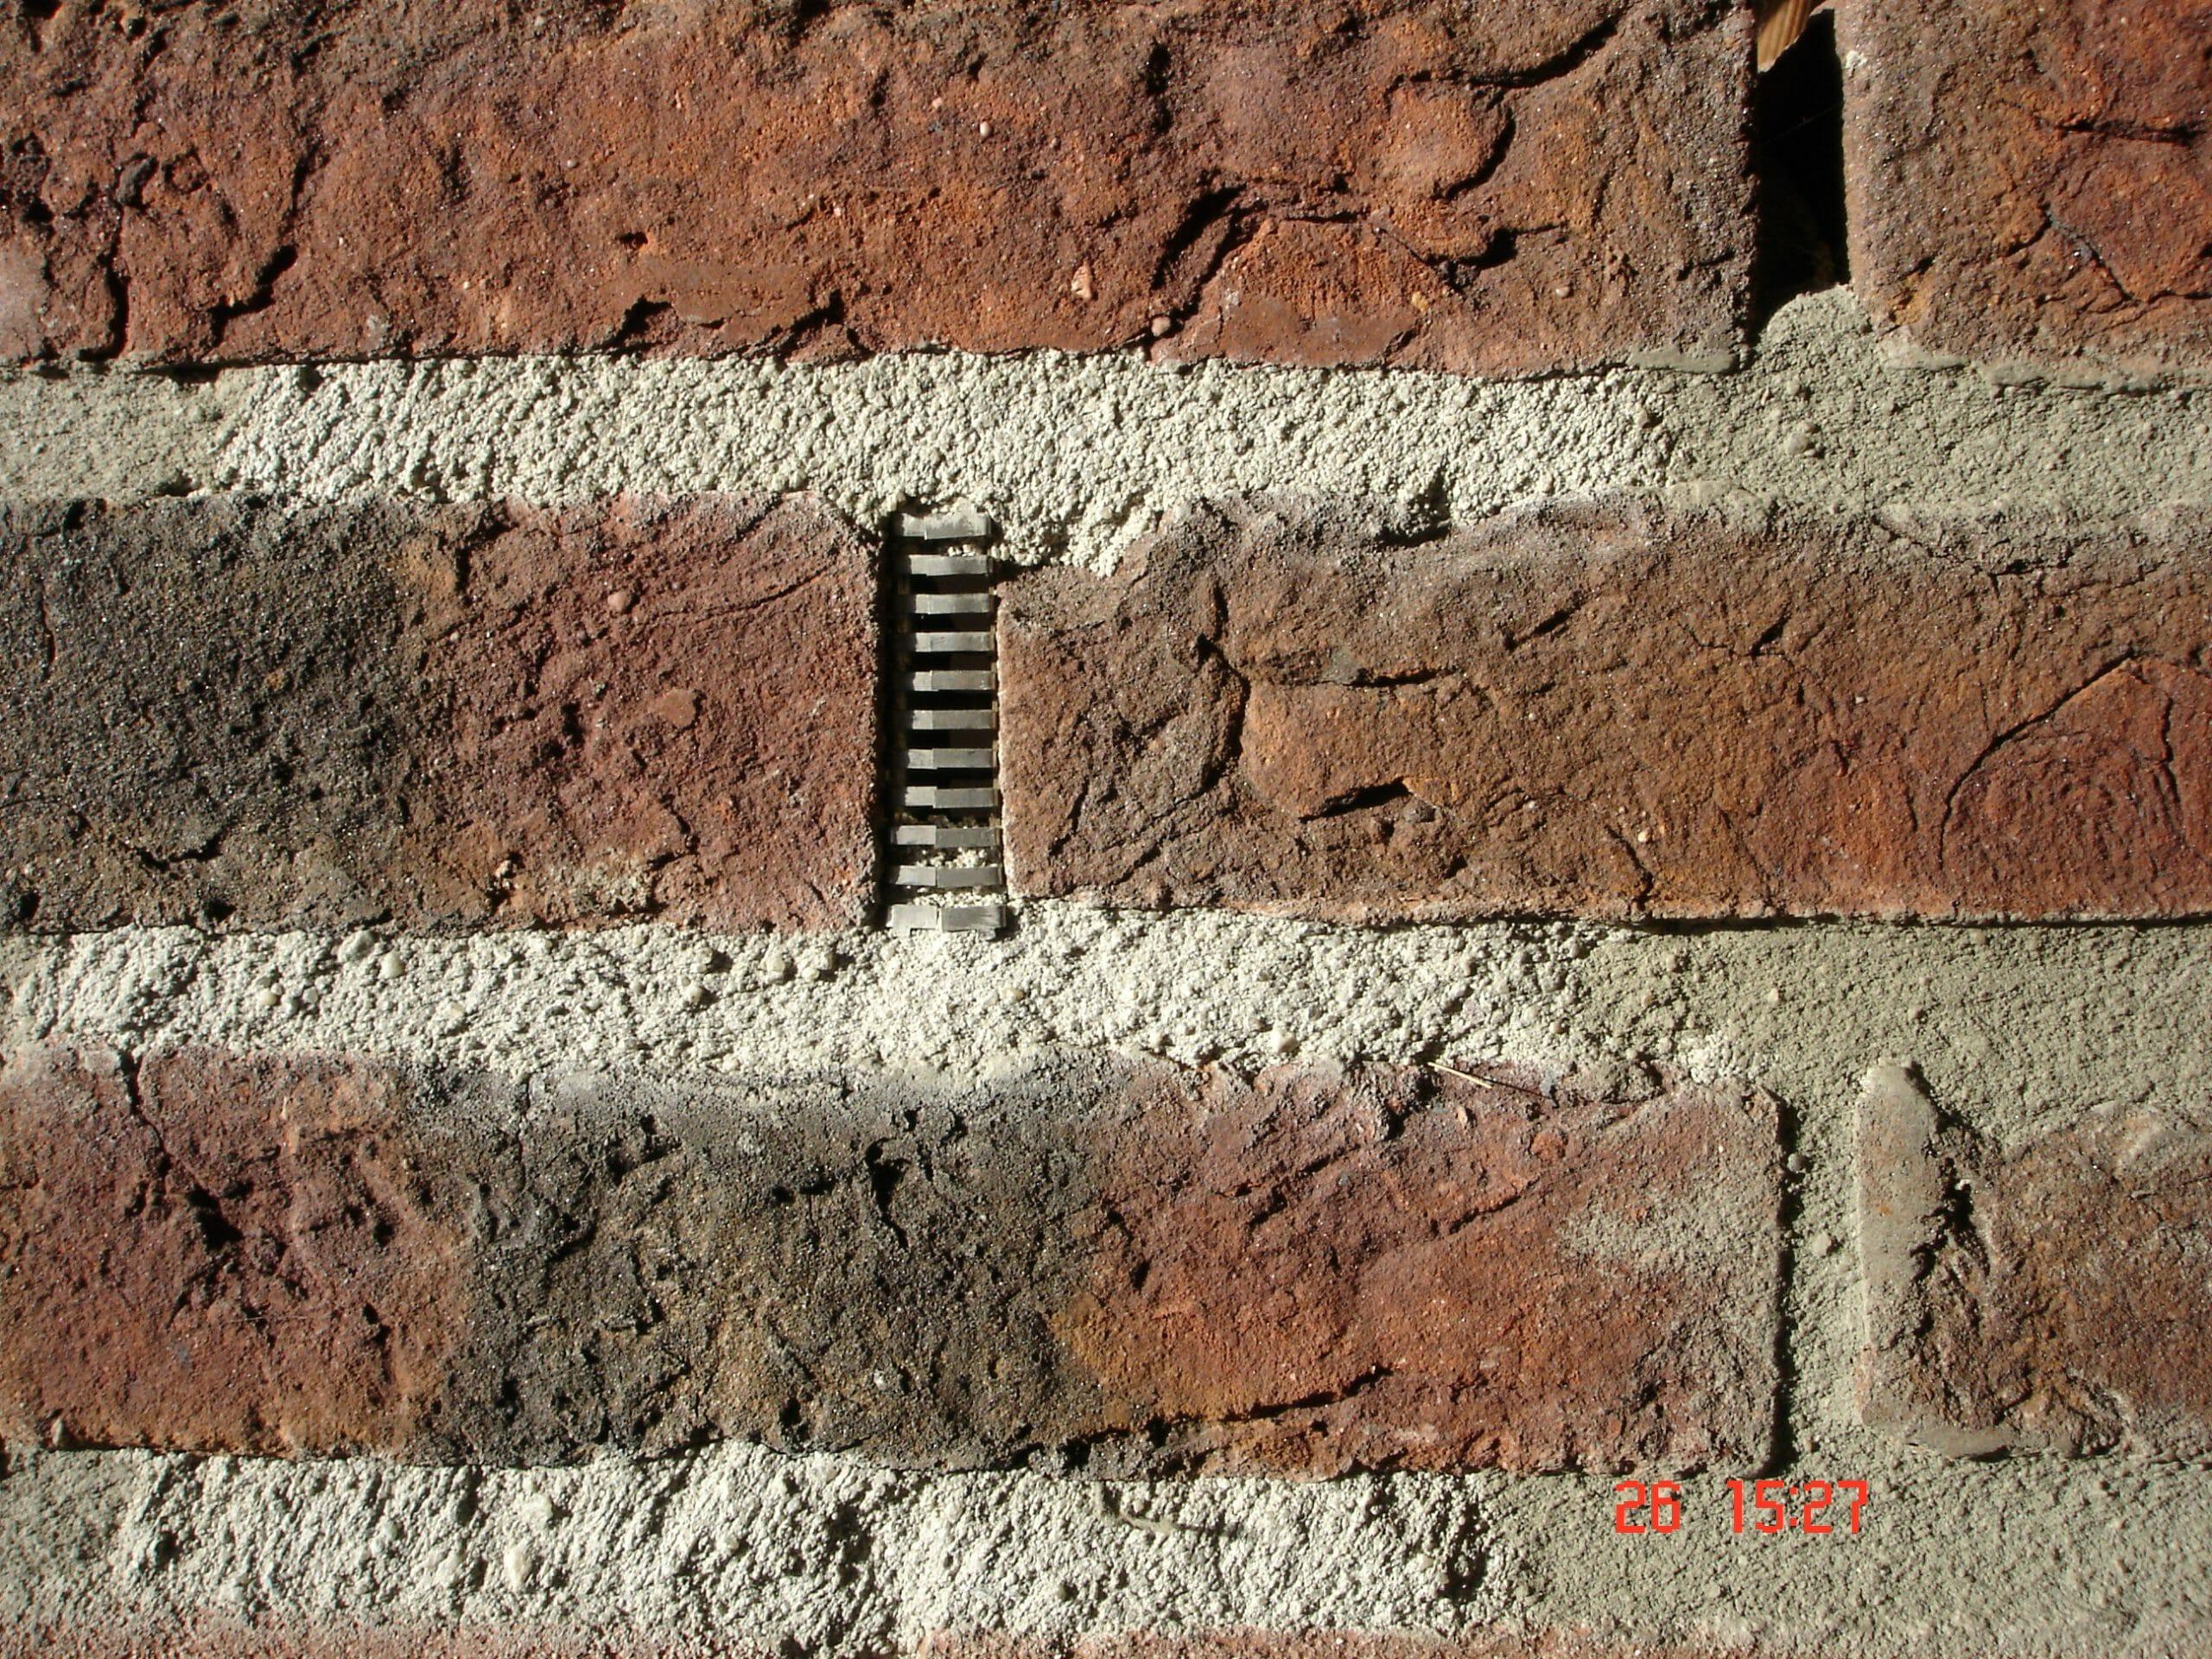 Voorbeeld-in-handvormsteen-nadien-gevoegd-scaled.jpg